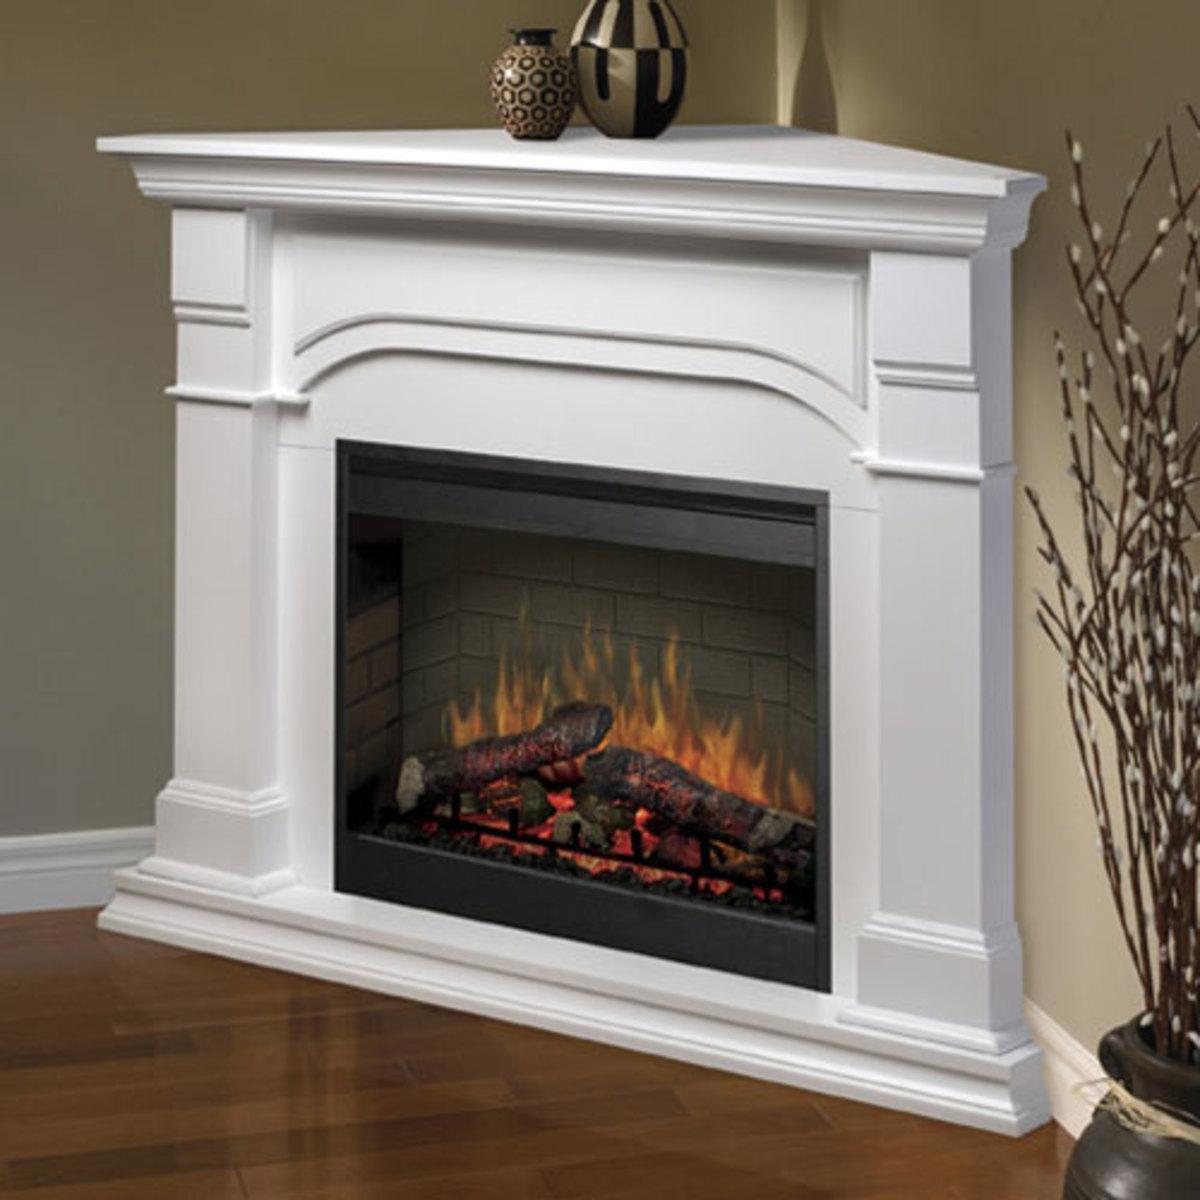 Buy An Electric Fireplace Make It A Corner Fireplace